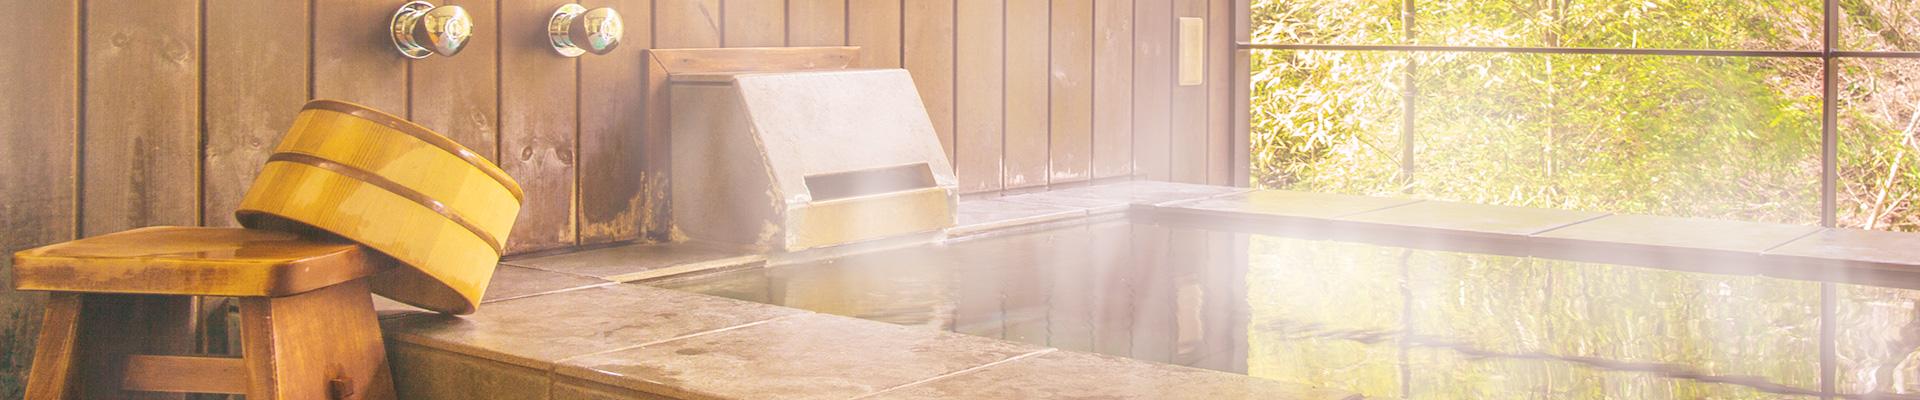 酵素風呂の入浴液